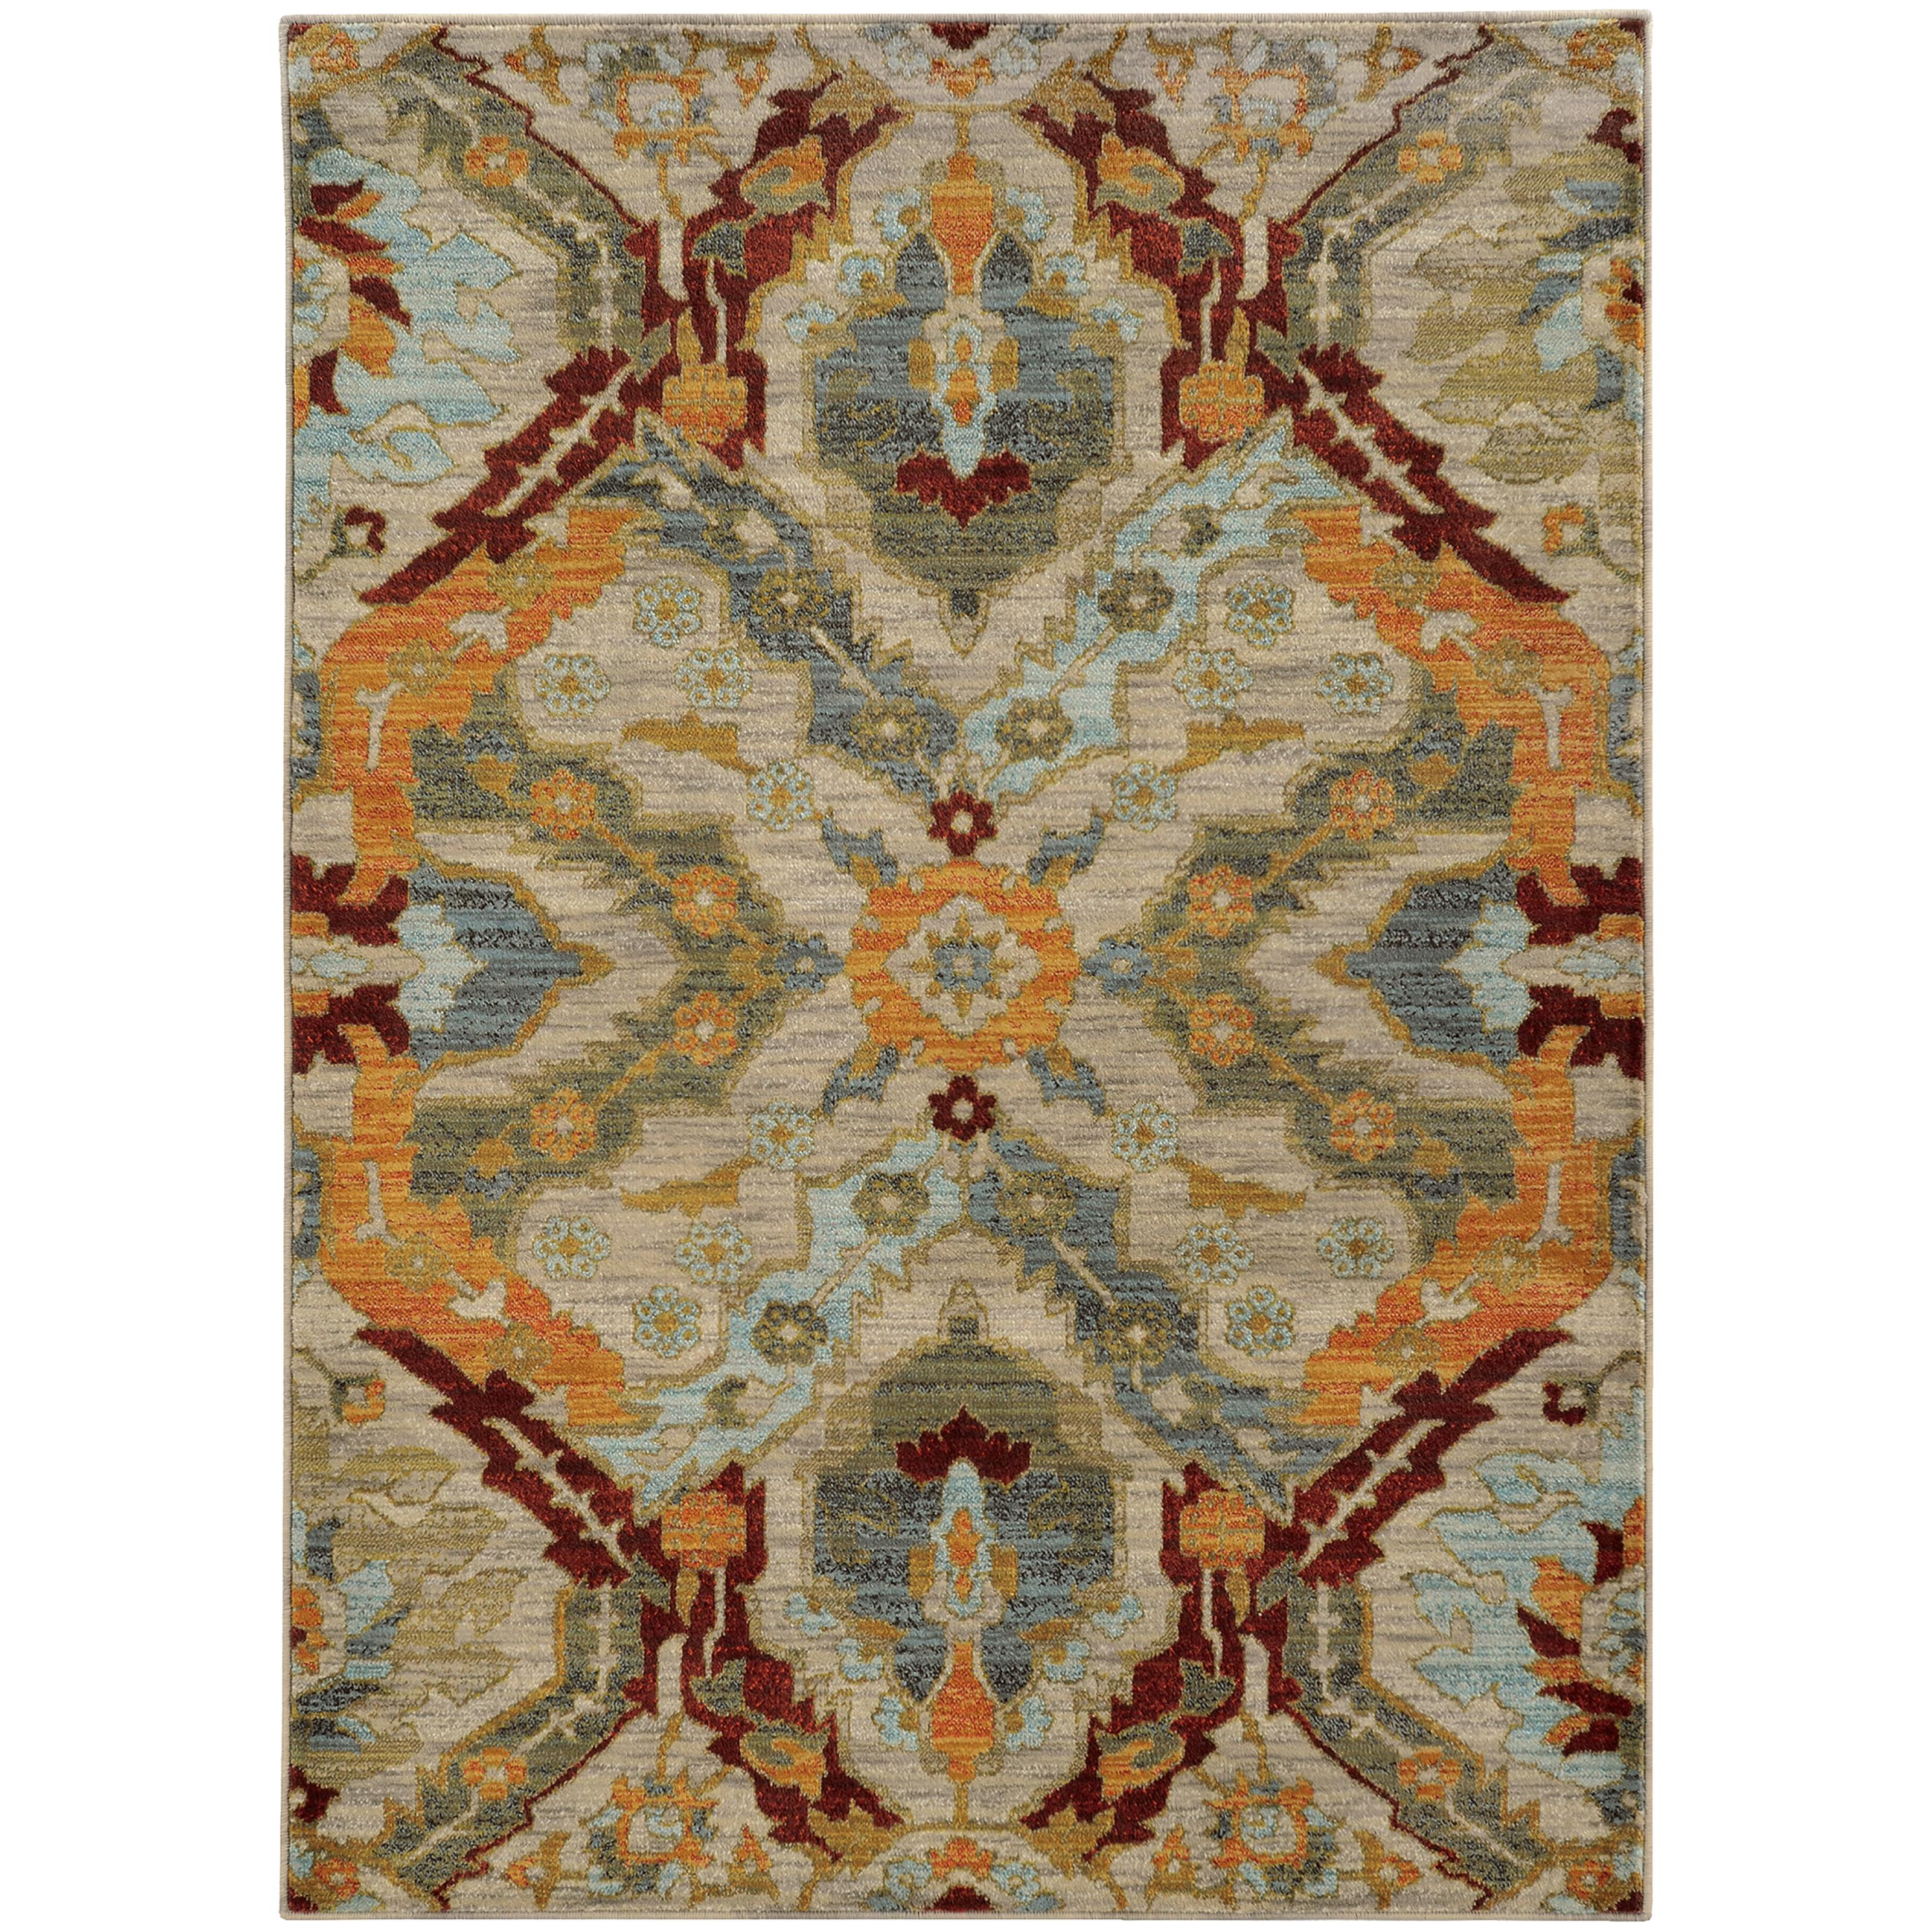 "Sedona 3'10"" X  5' 5"" Rug by Oriental Weavers at Novello Home Furnishings"